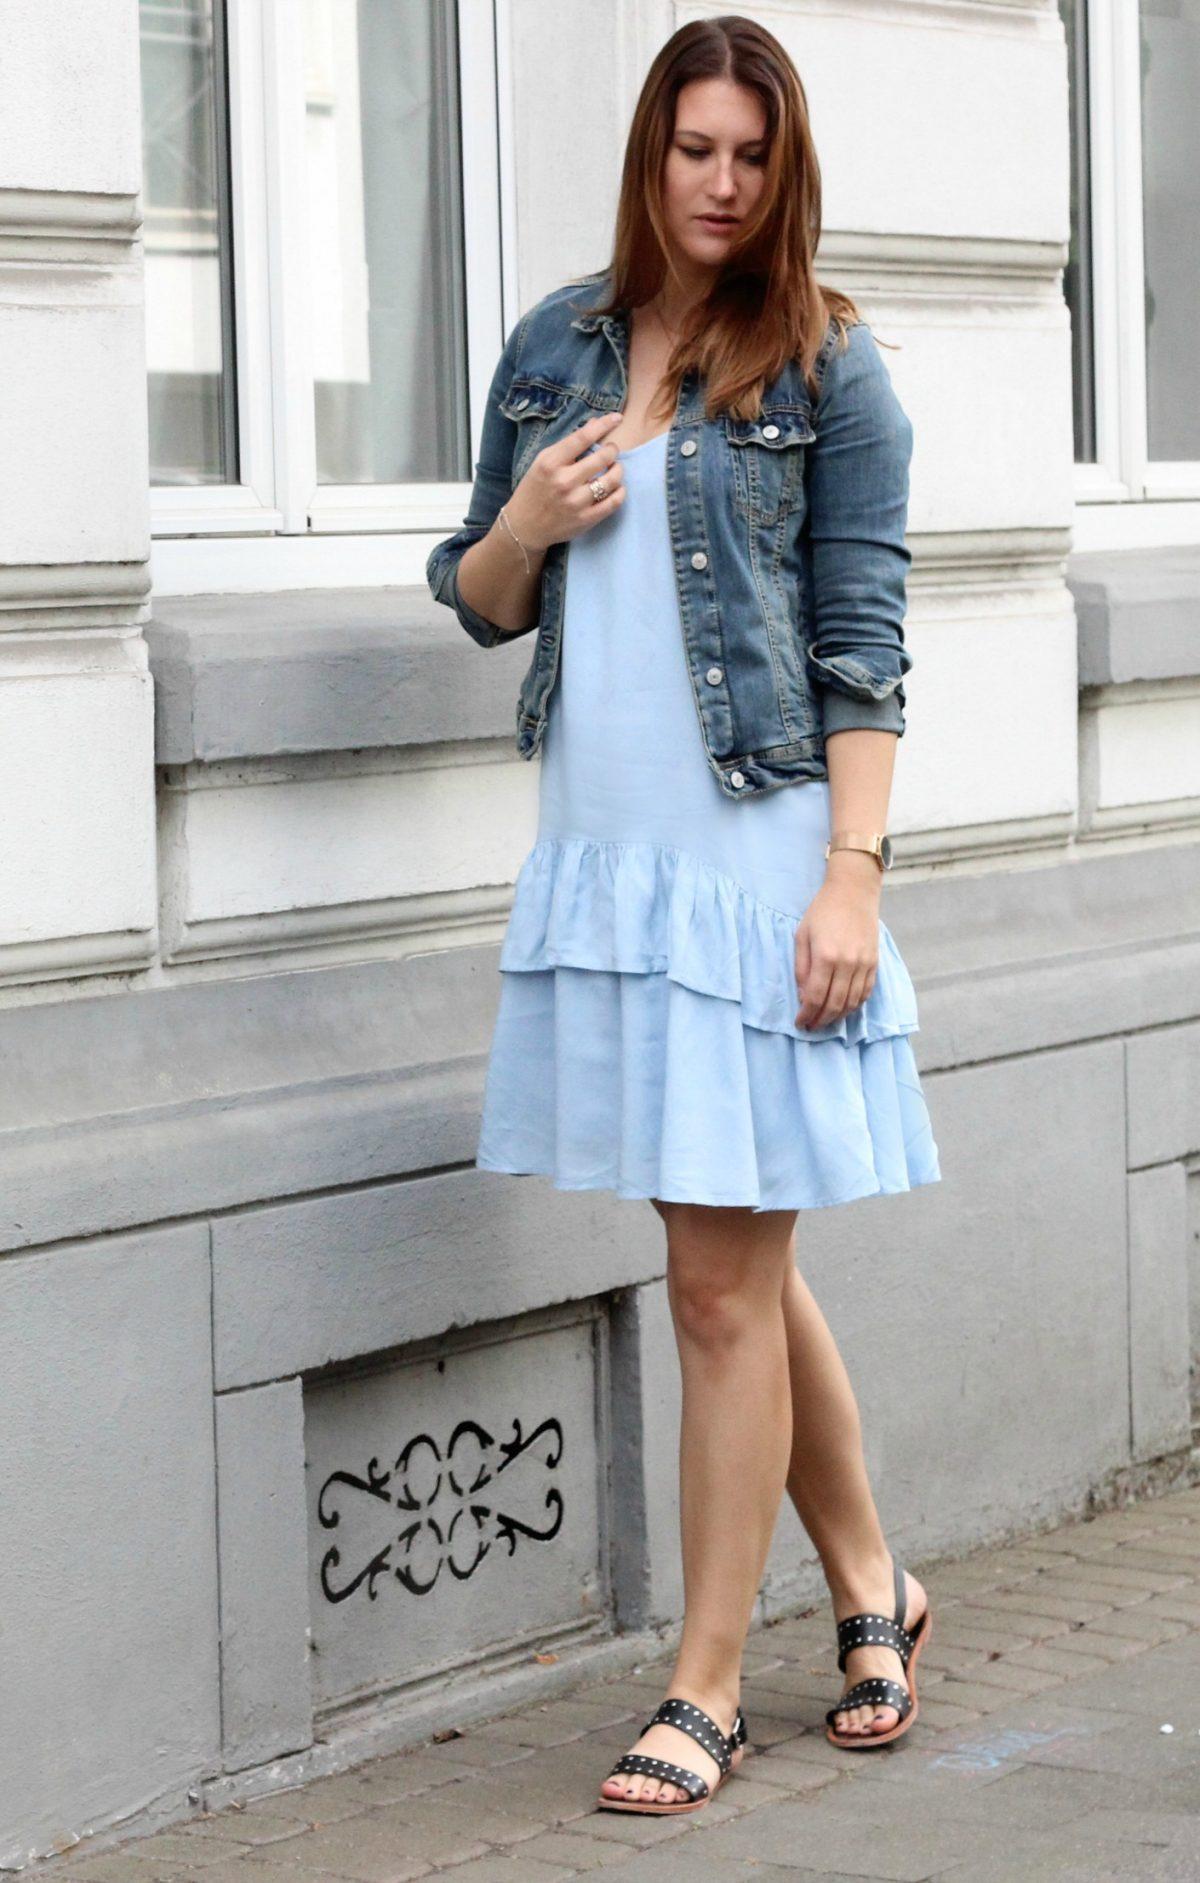 Fashionblog Koeln_Modeblog_Blaues Kleid_Jeansjacke_7